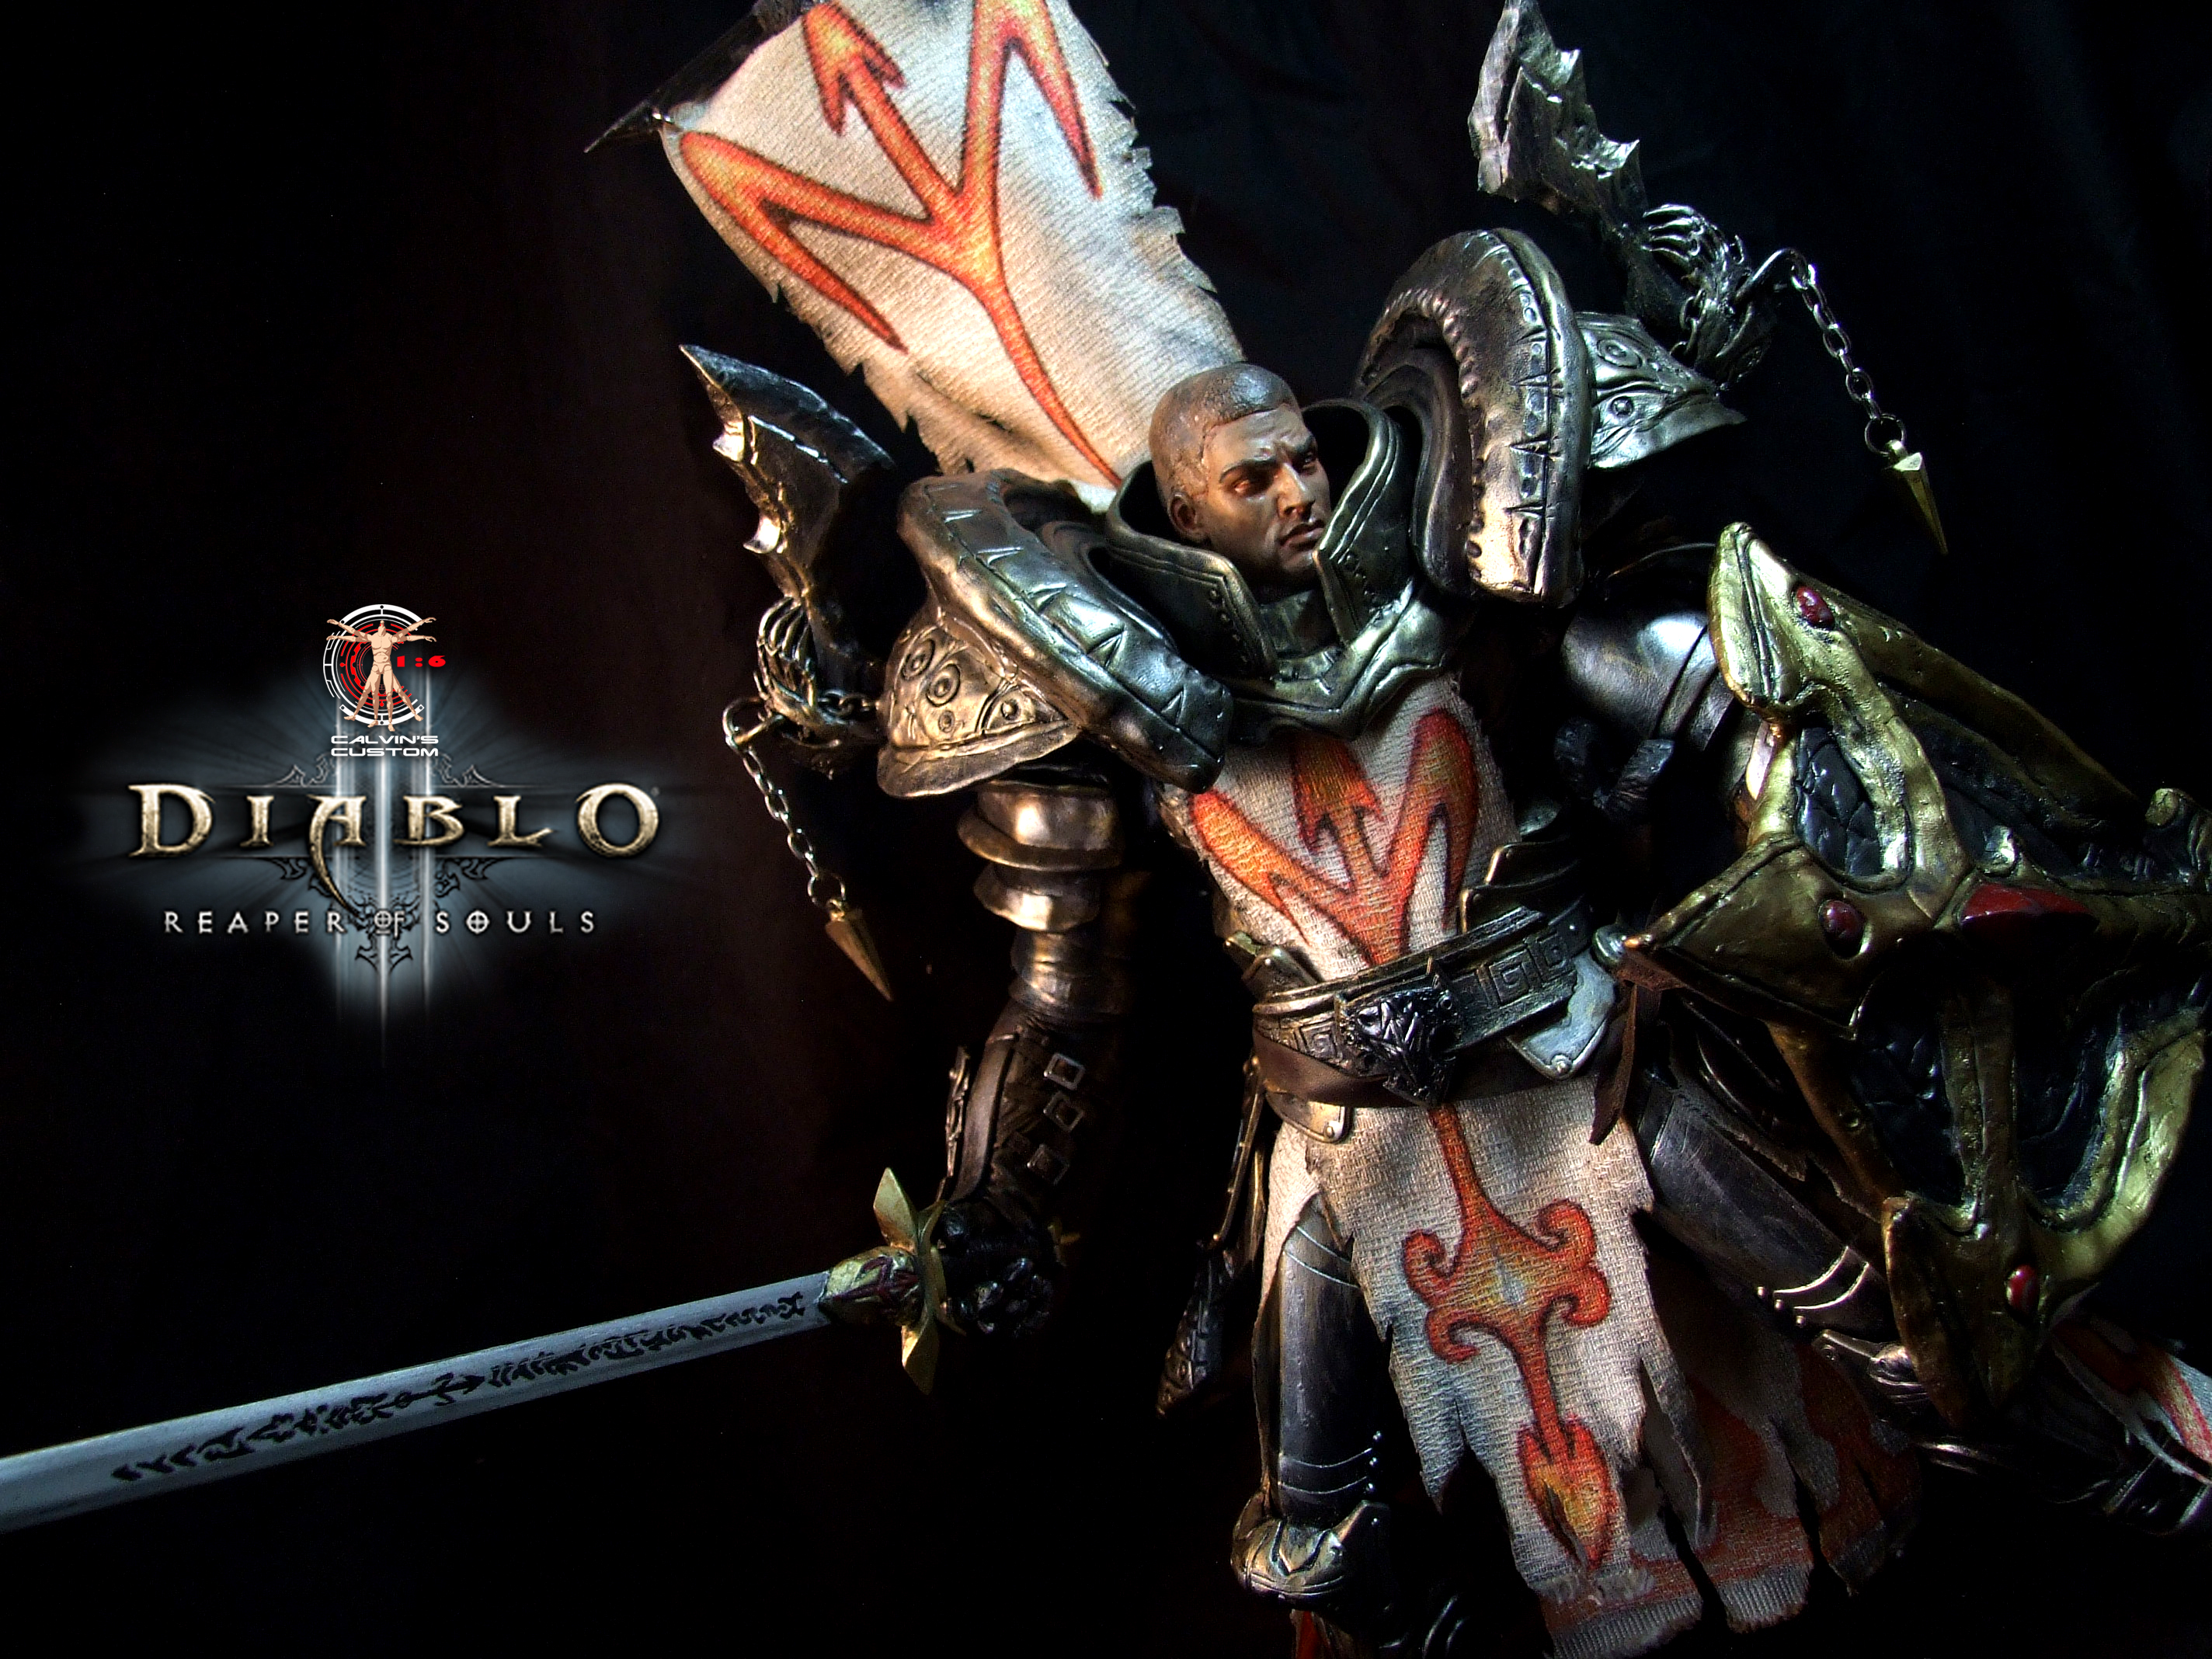 Calvin's Custom One Sixth Scale Diablo 3 Reaper of Souls